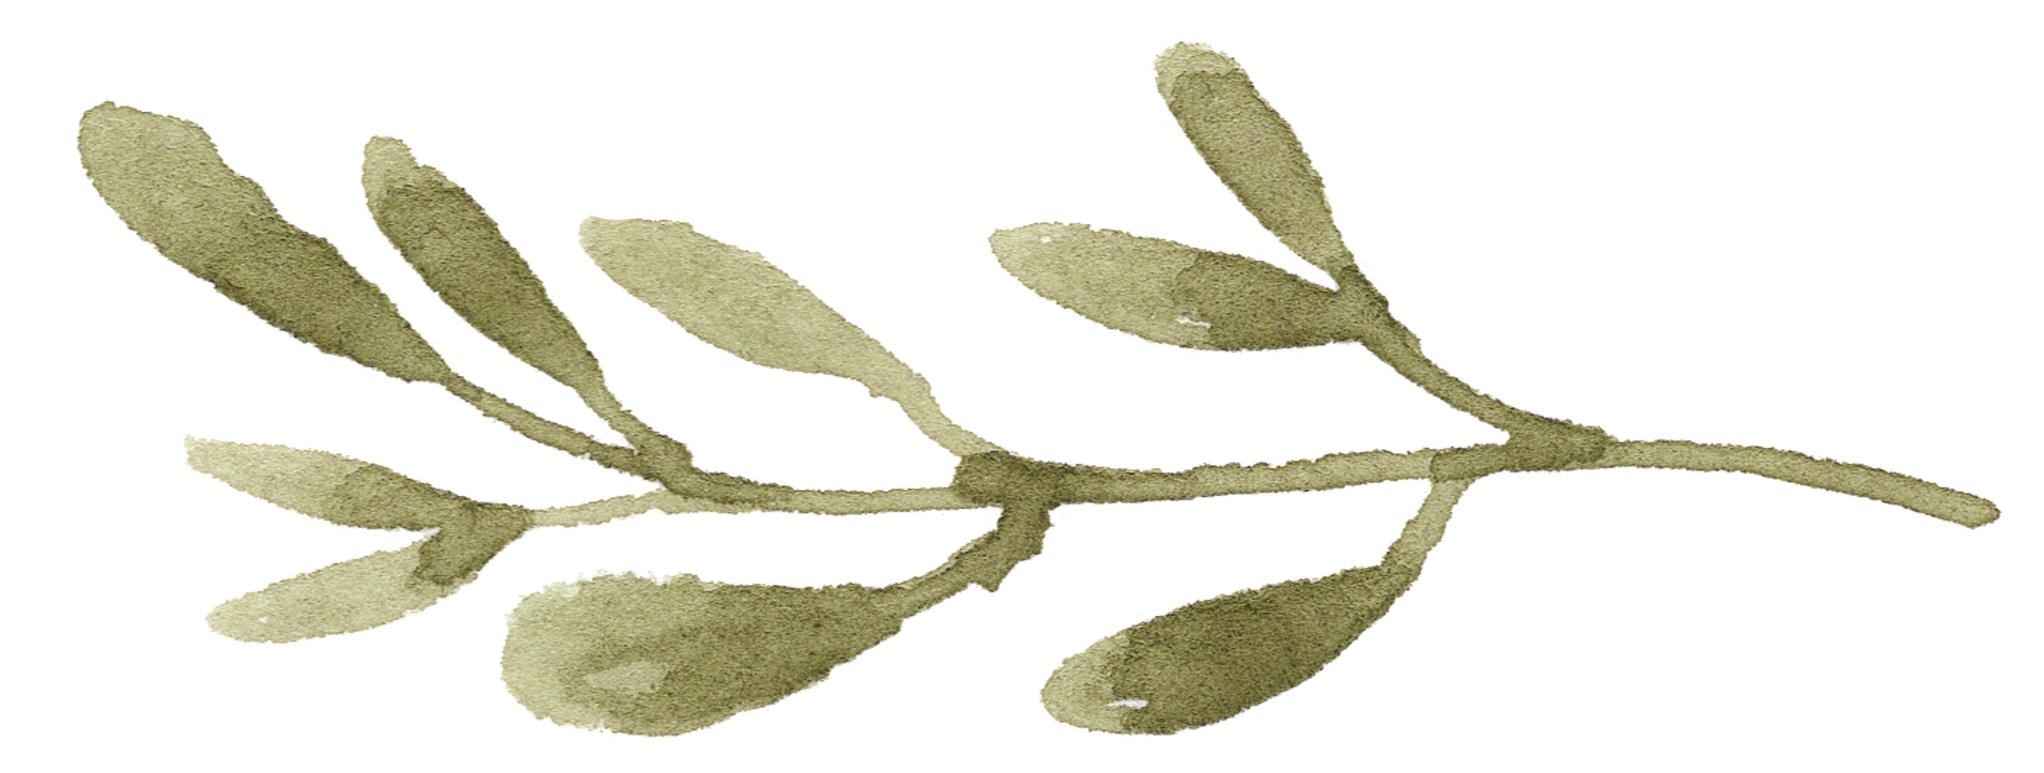 14+Mistletoe.jpg